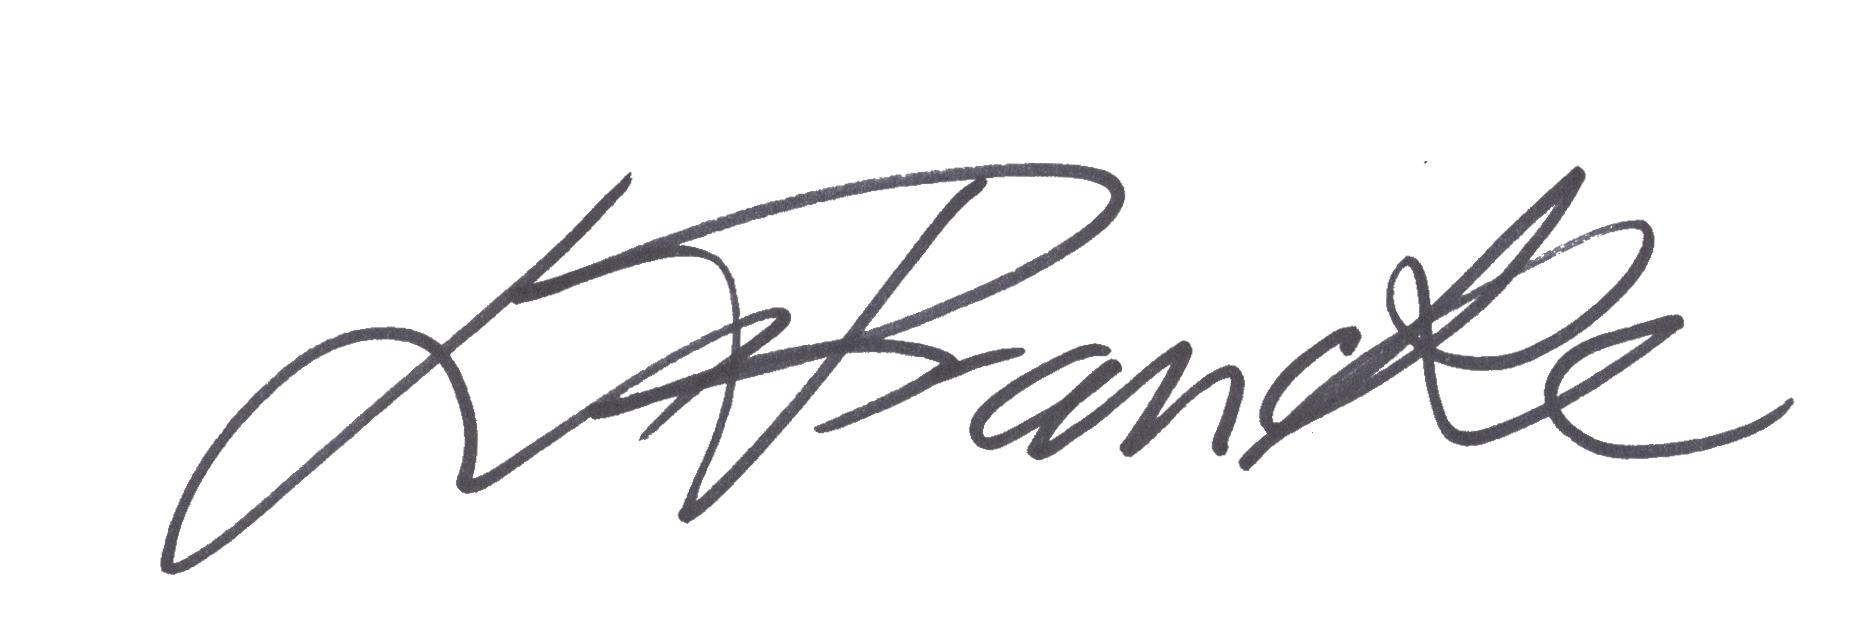 Louise Francke Signature